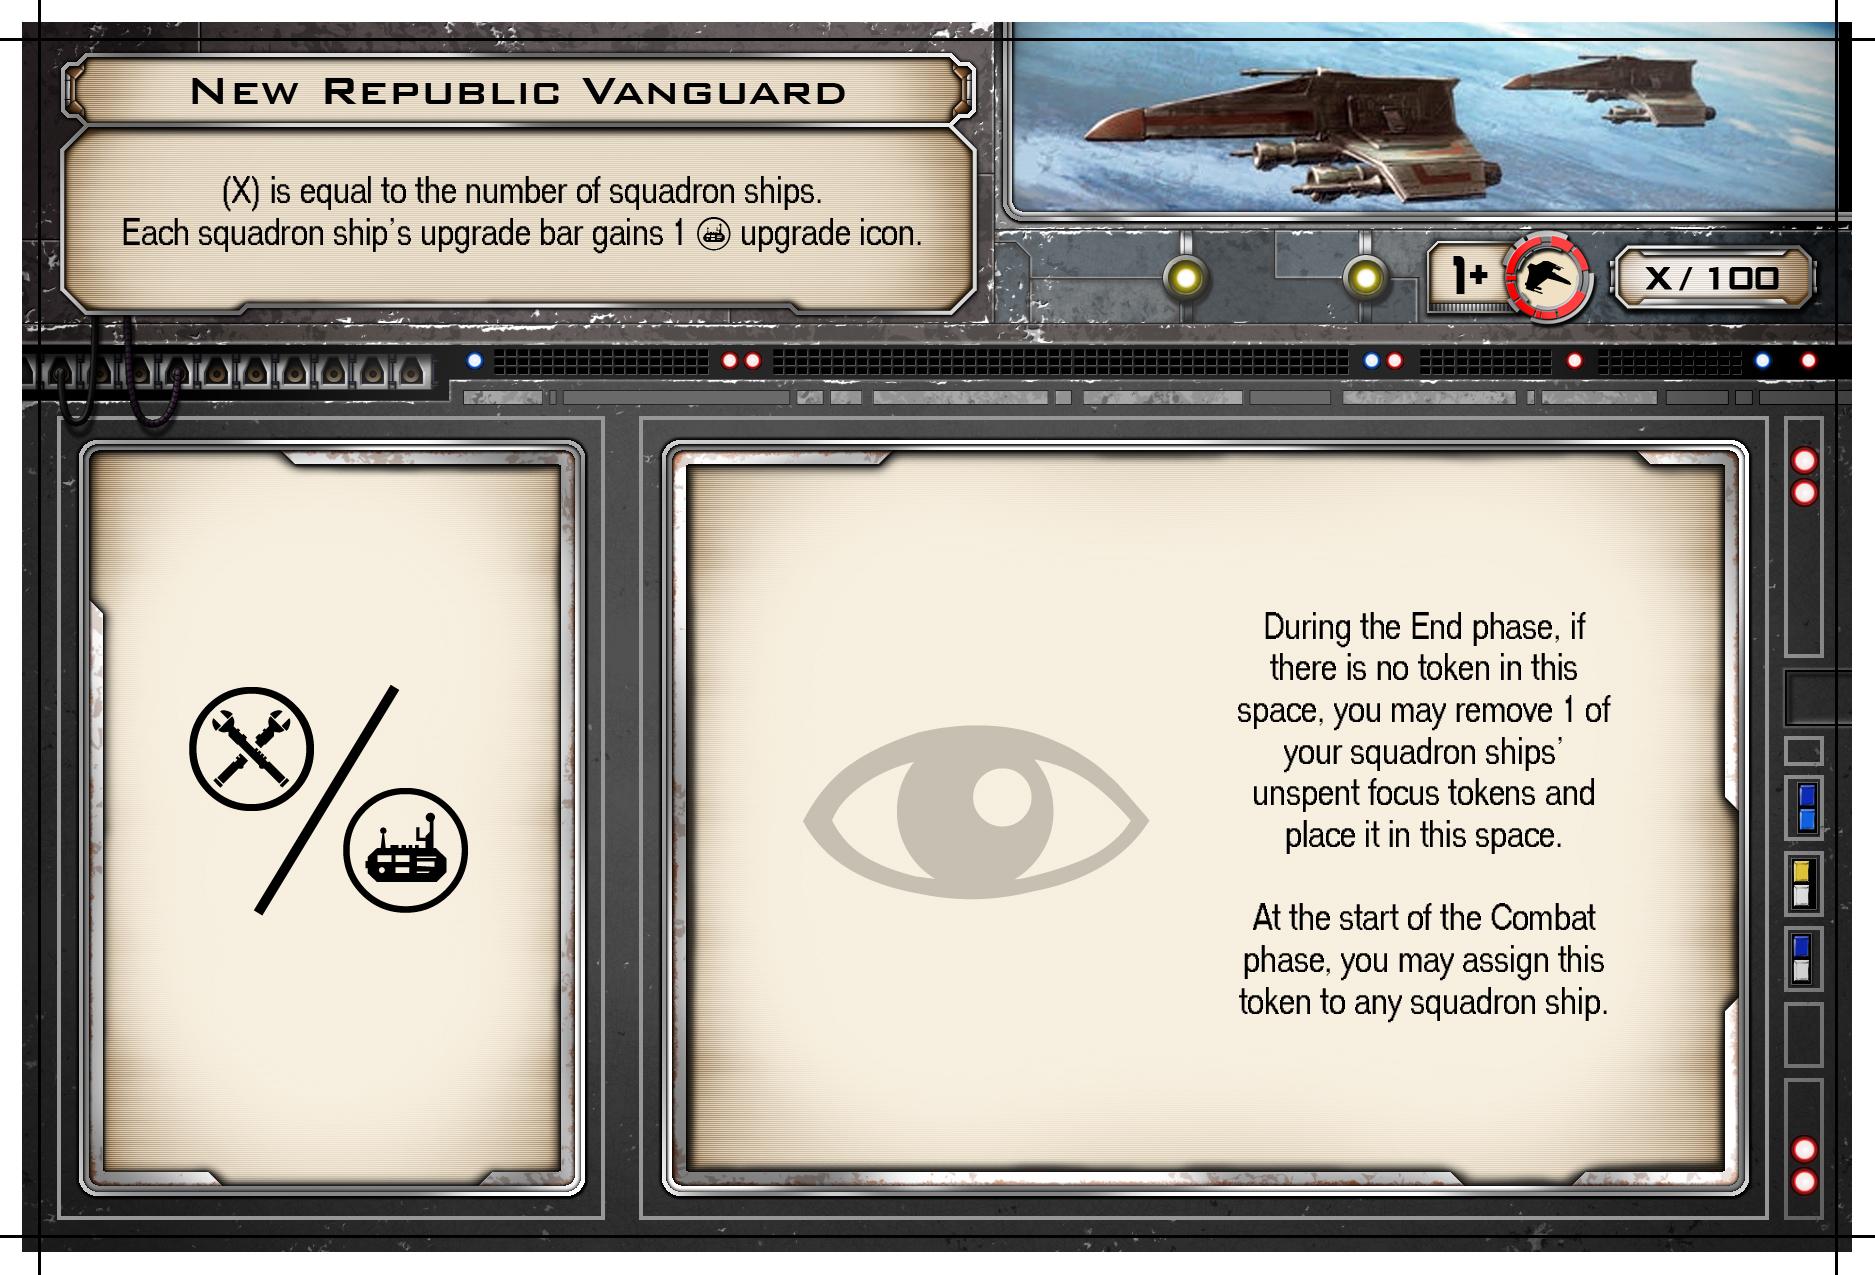 new-republic-vanguard.jpg